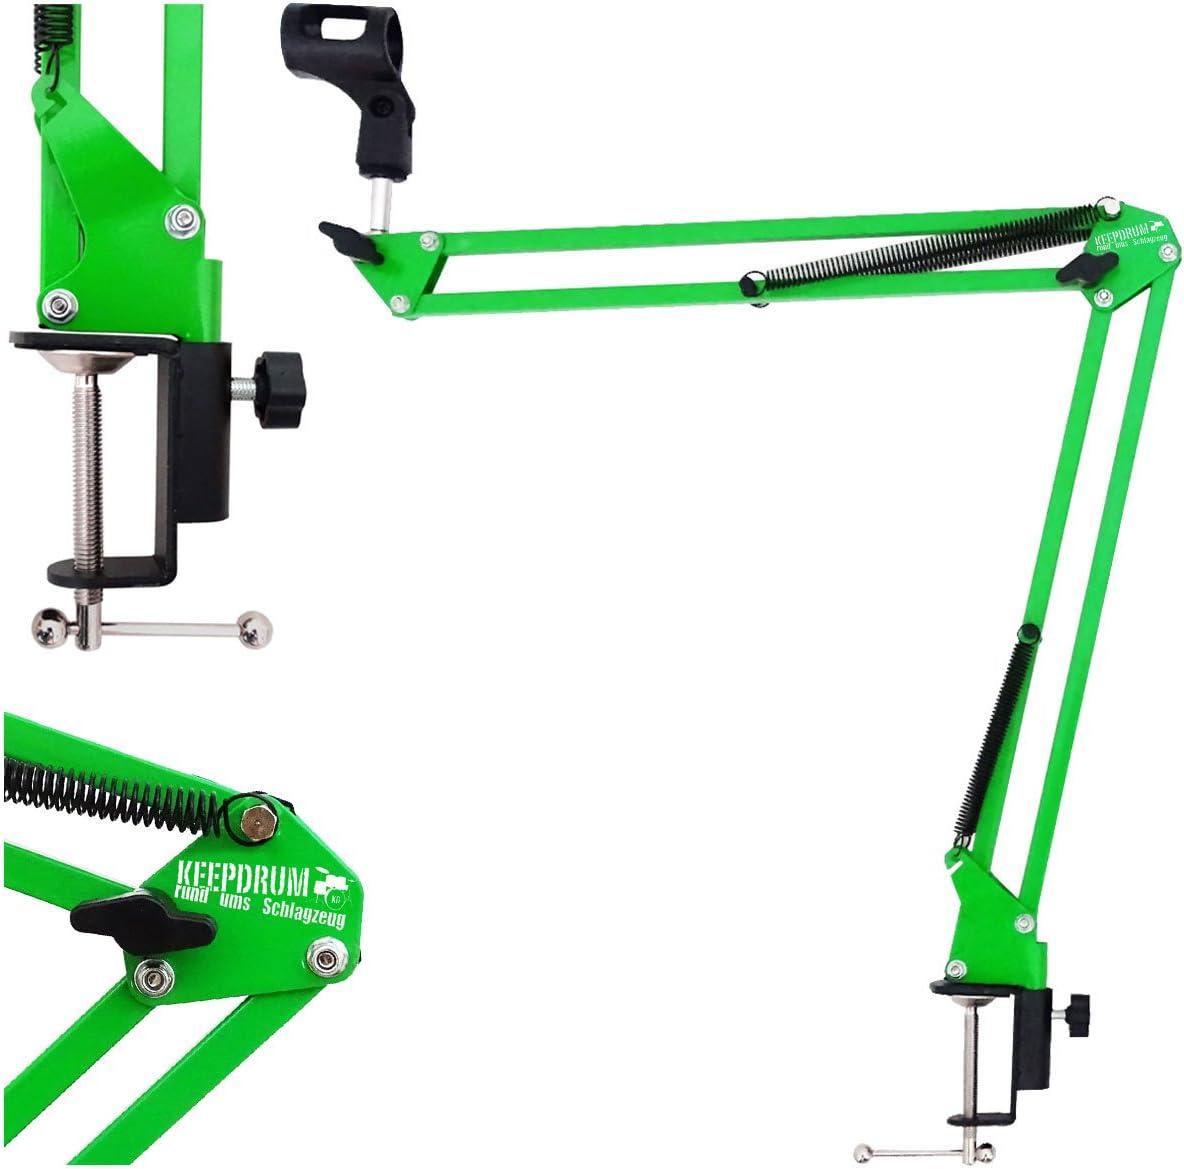 Keepdrum 5-nb35/gr verde mesa brazo de micr/ófono micr/ófono de tr/ípode brazo de giro